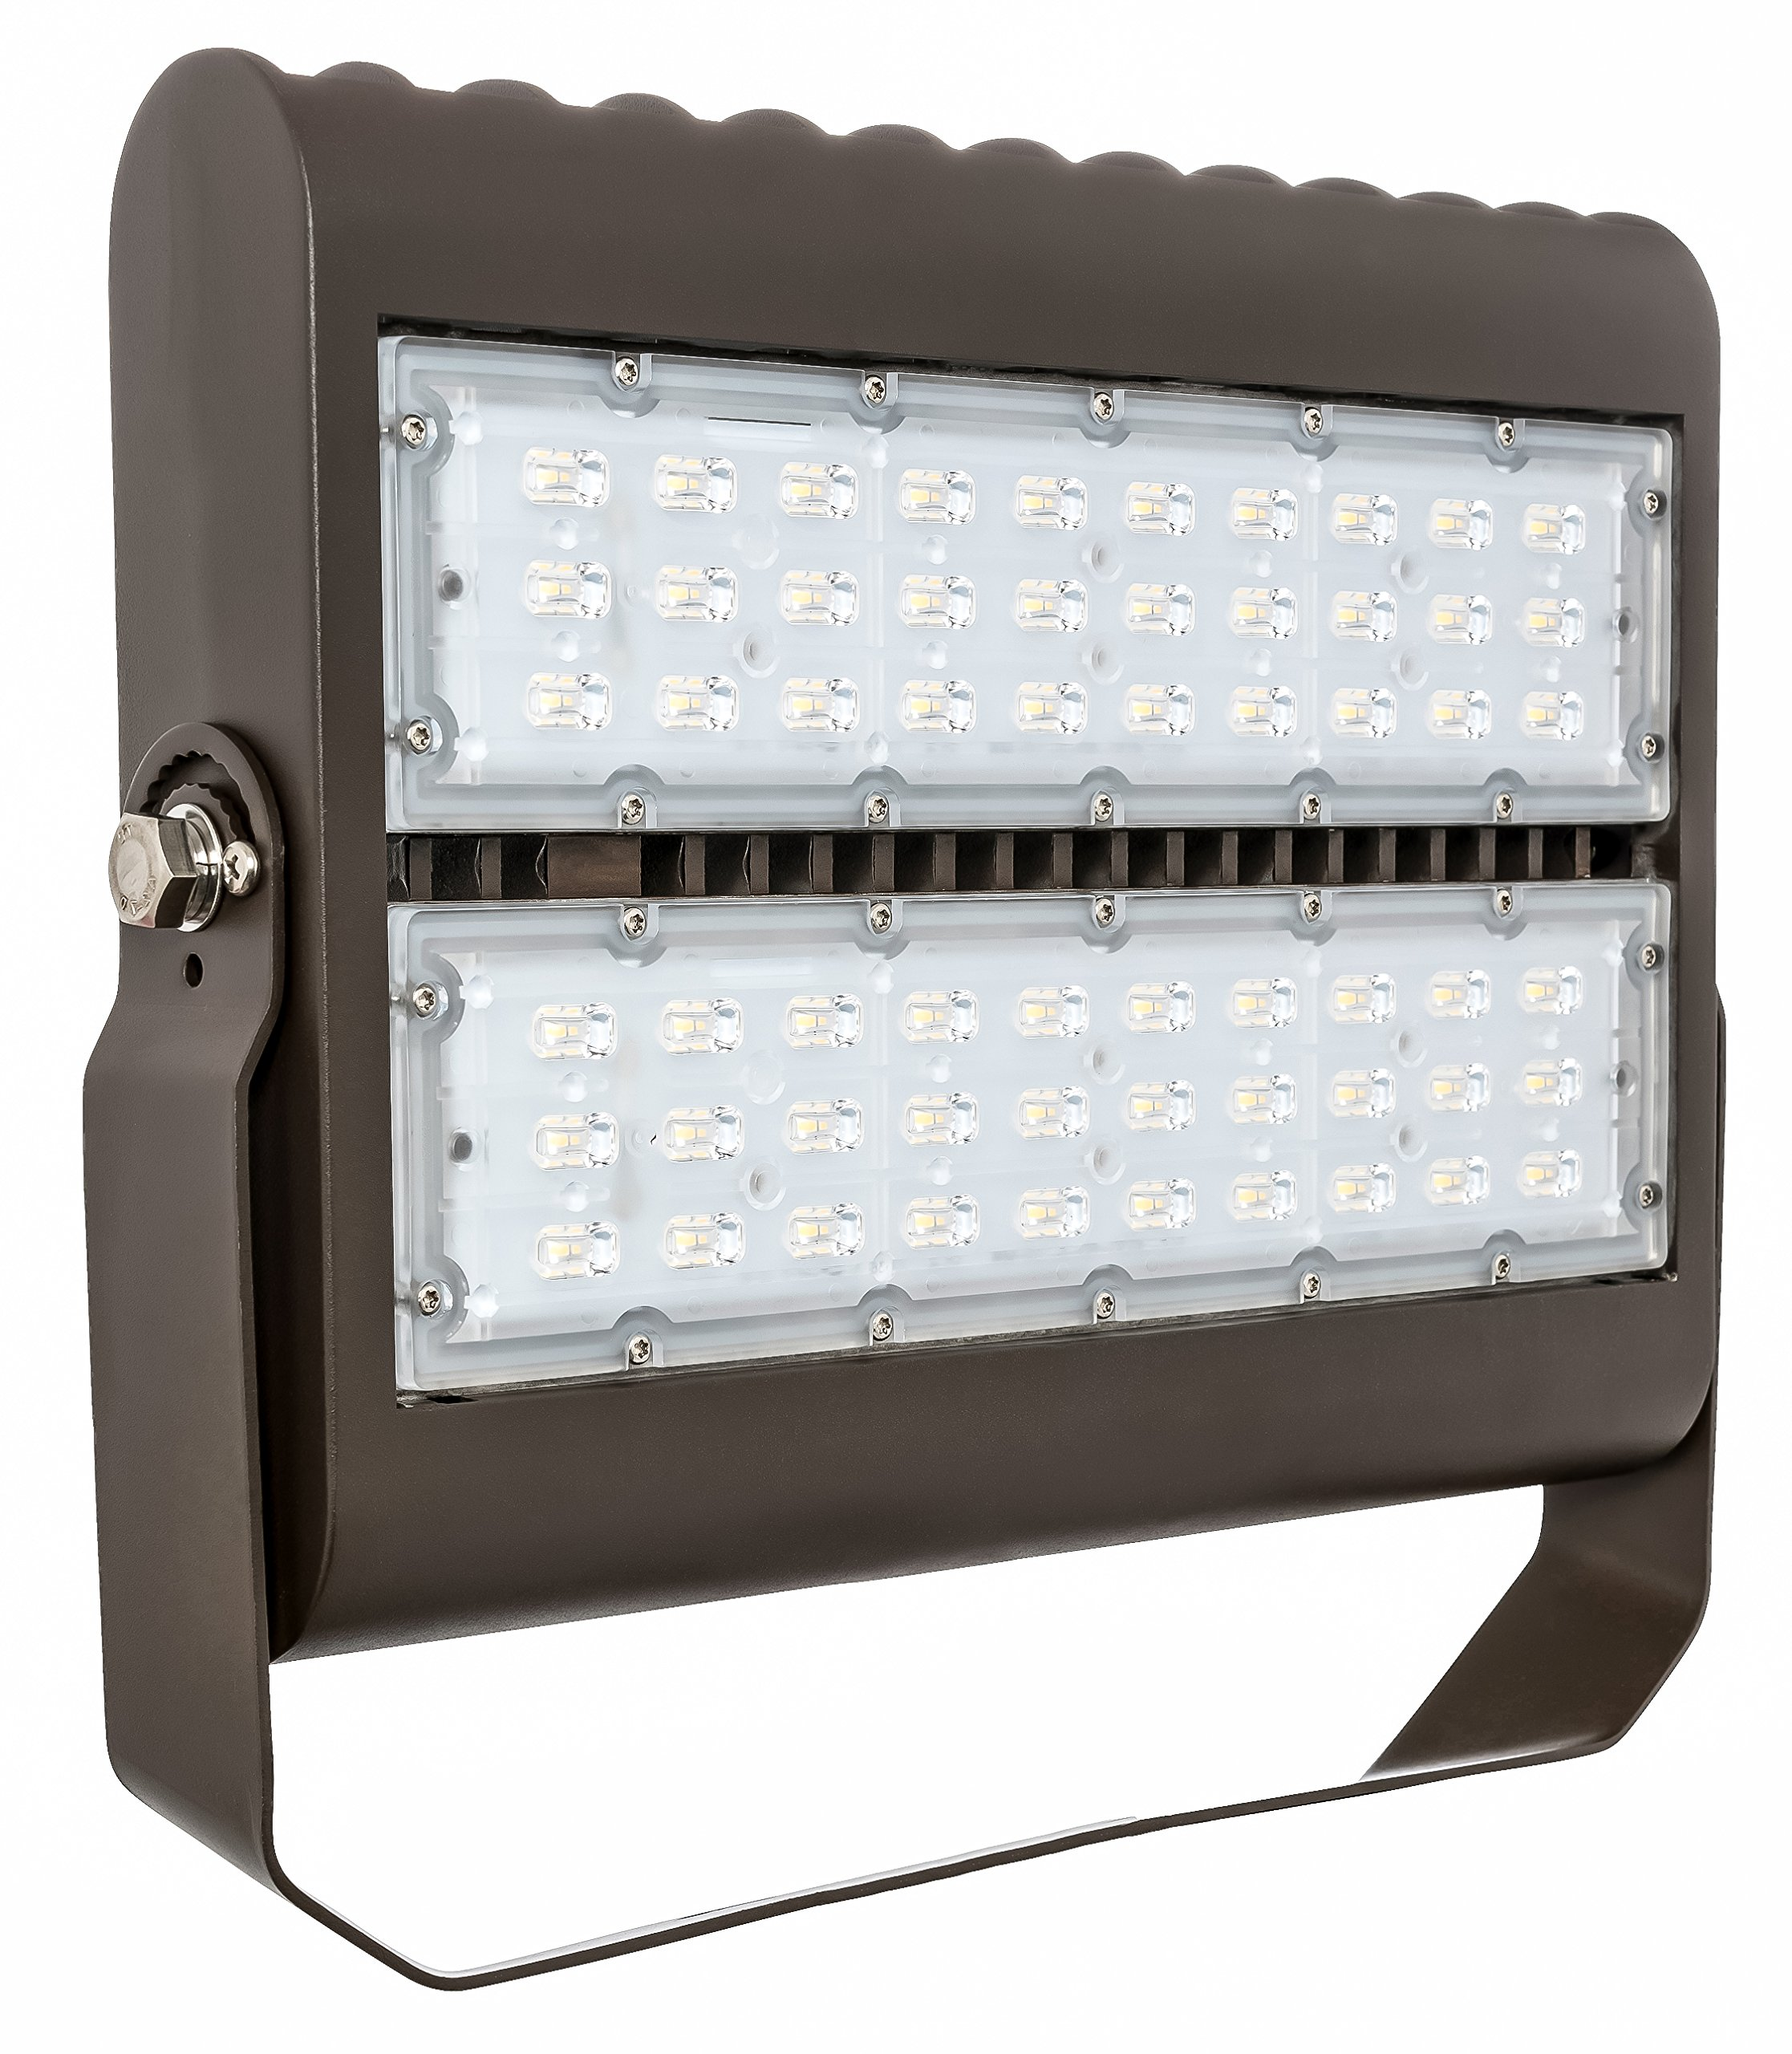 Westgate Lighting Flood Light Series-Die cast Aluminium housing with white powder coat finish -7 Year Unlimited Warranty (100W, 3000K Warm White)